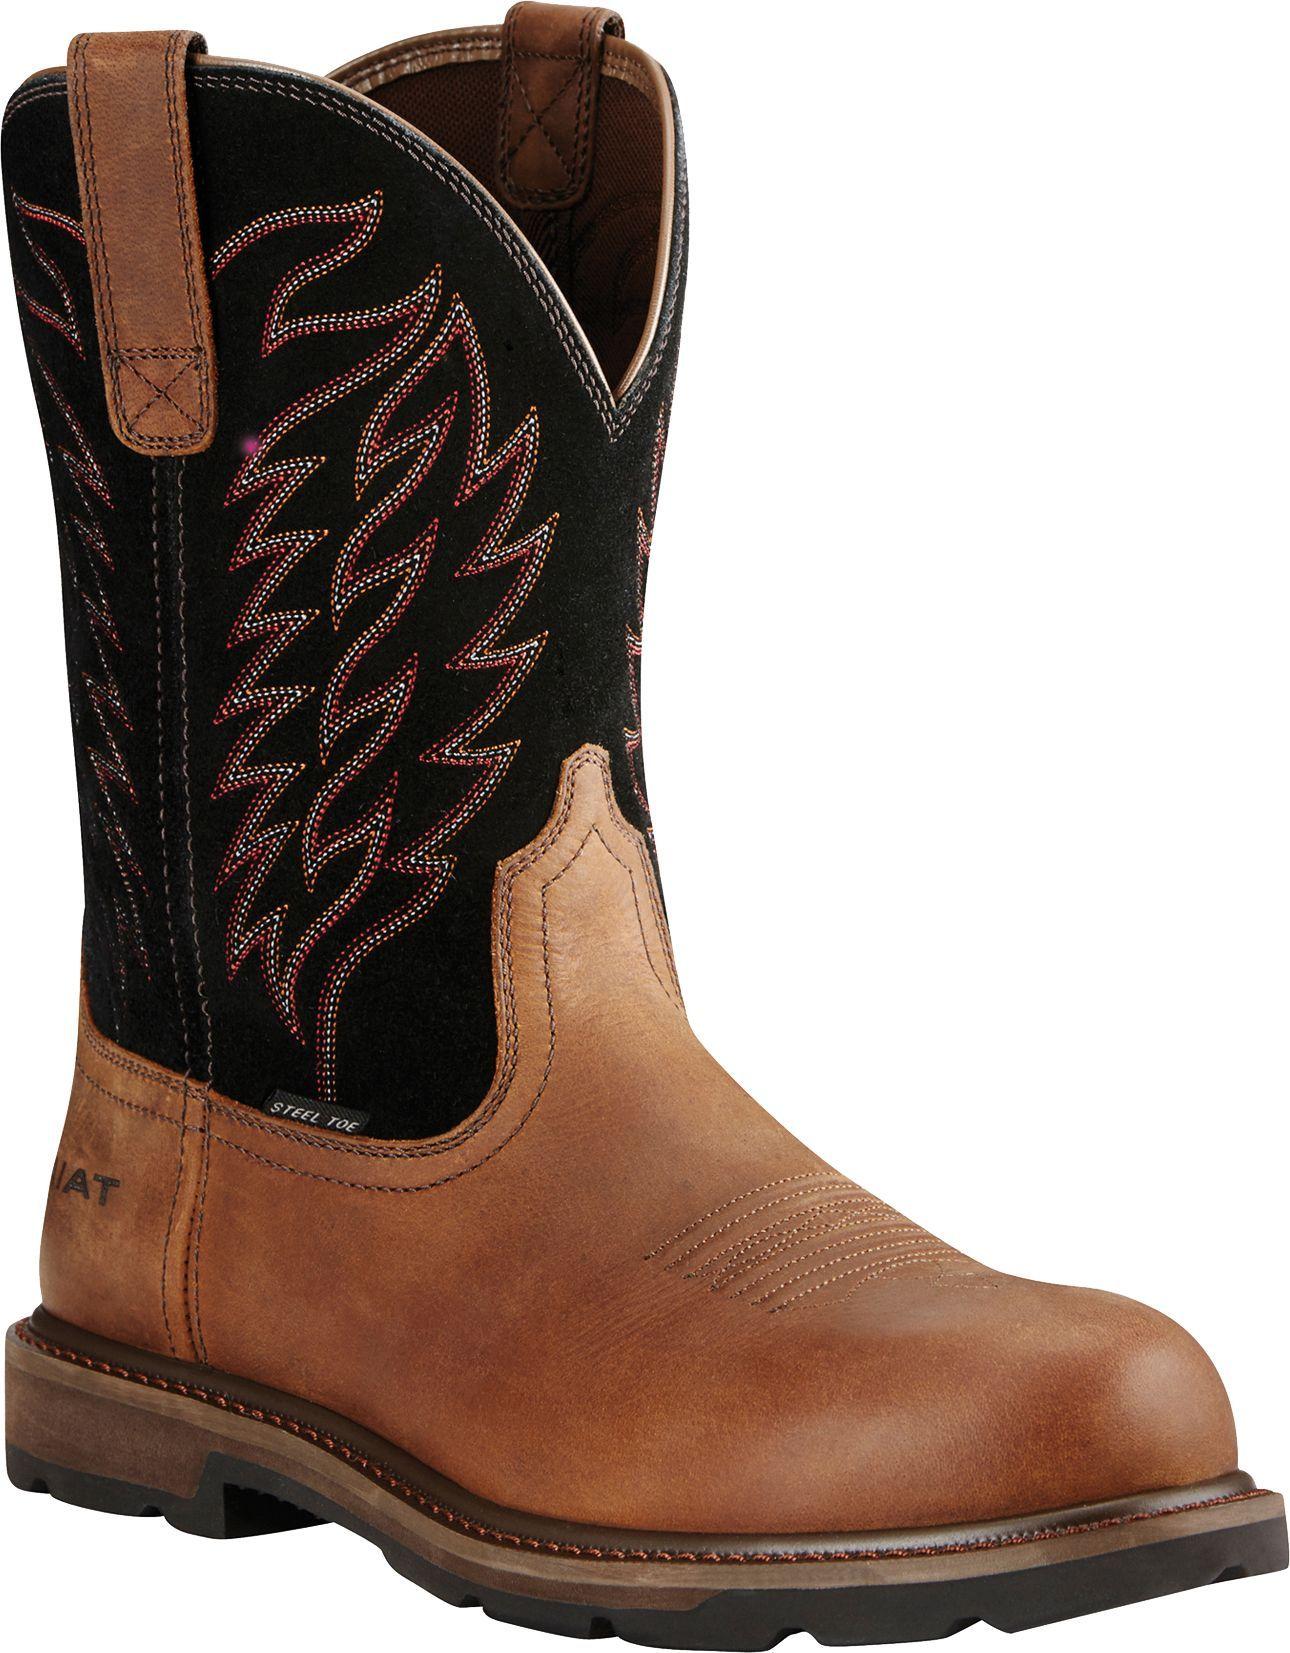 Men's WorkHog XT Waterproof Work Boots in Oily Distressed